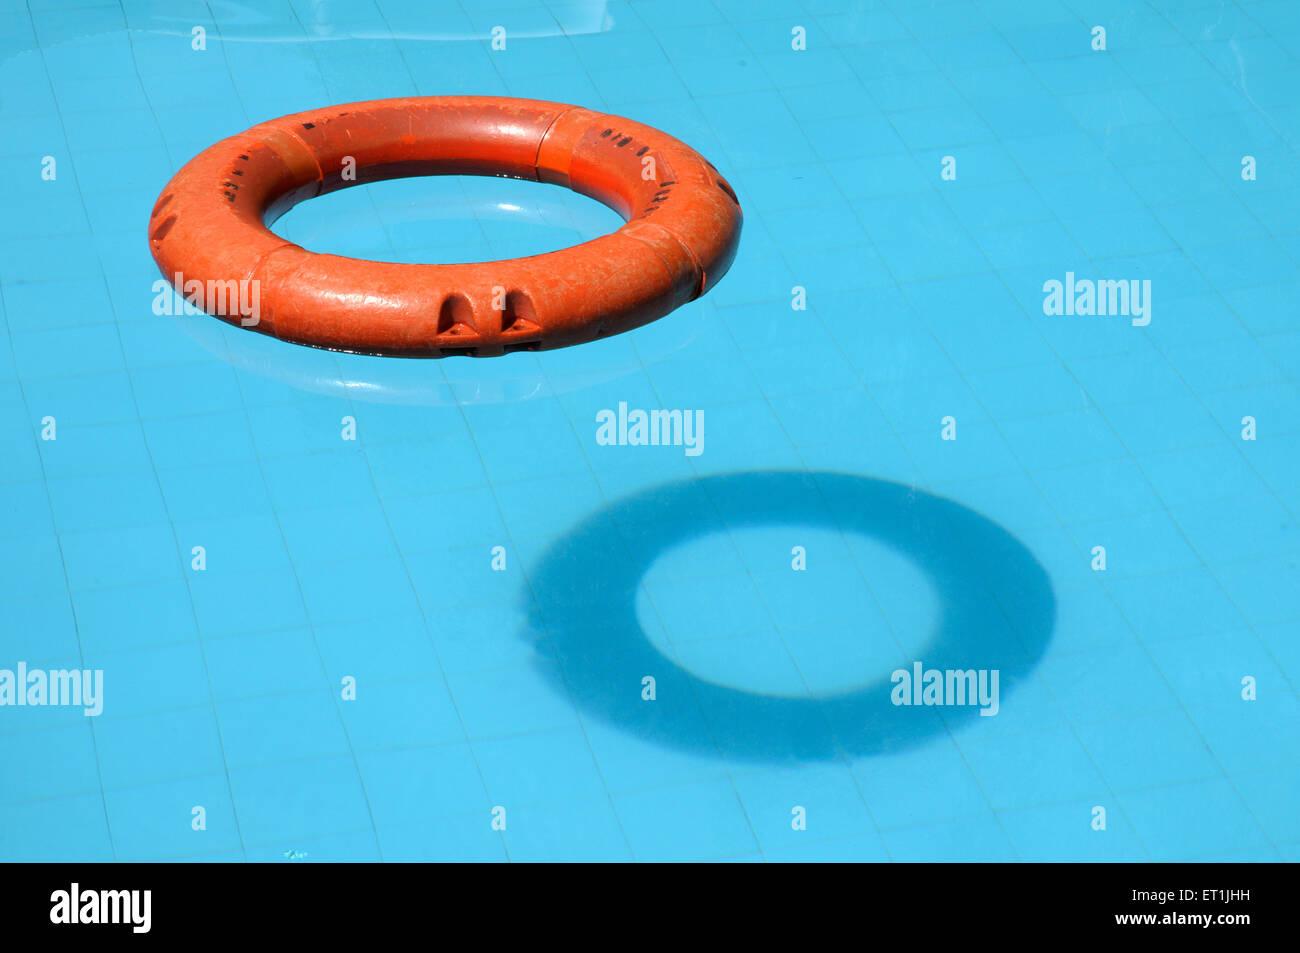 Rescue equipment lifeguard ring buoy floating on swimming pool in surya shibir ; Pune ; Maharashtra ; India 12 July - Stock Image